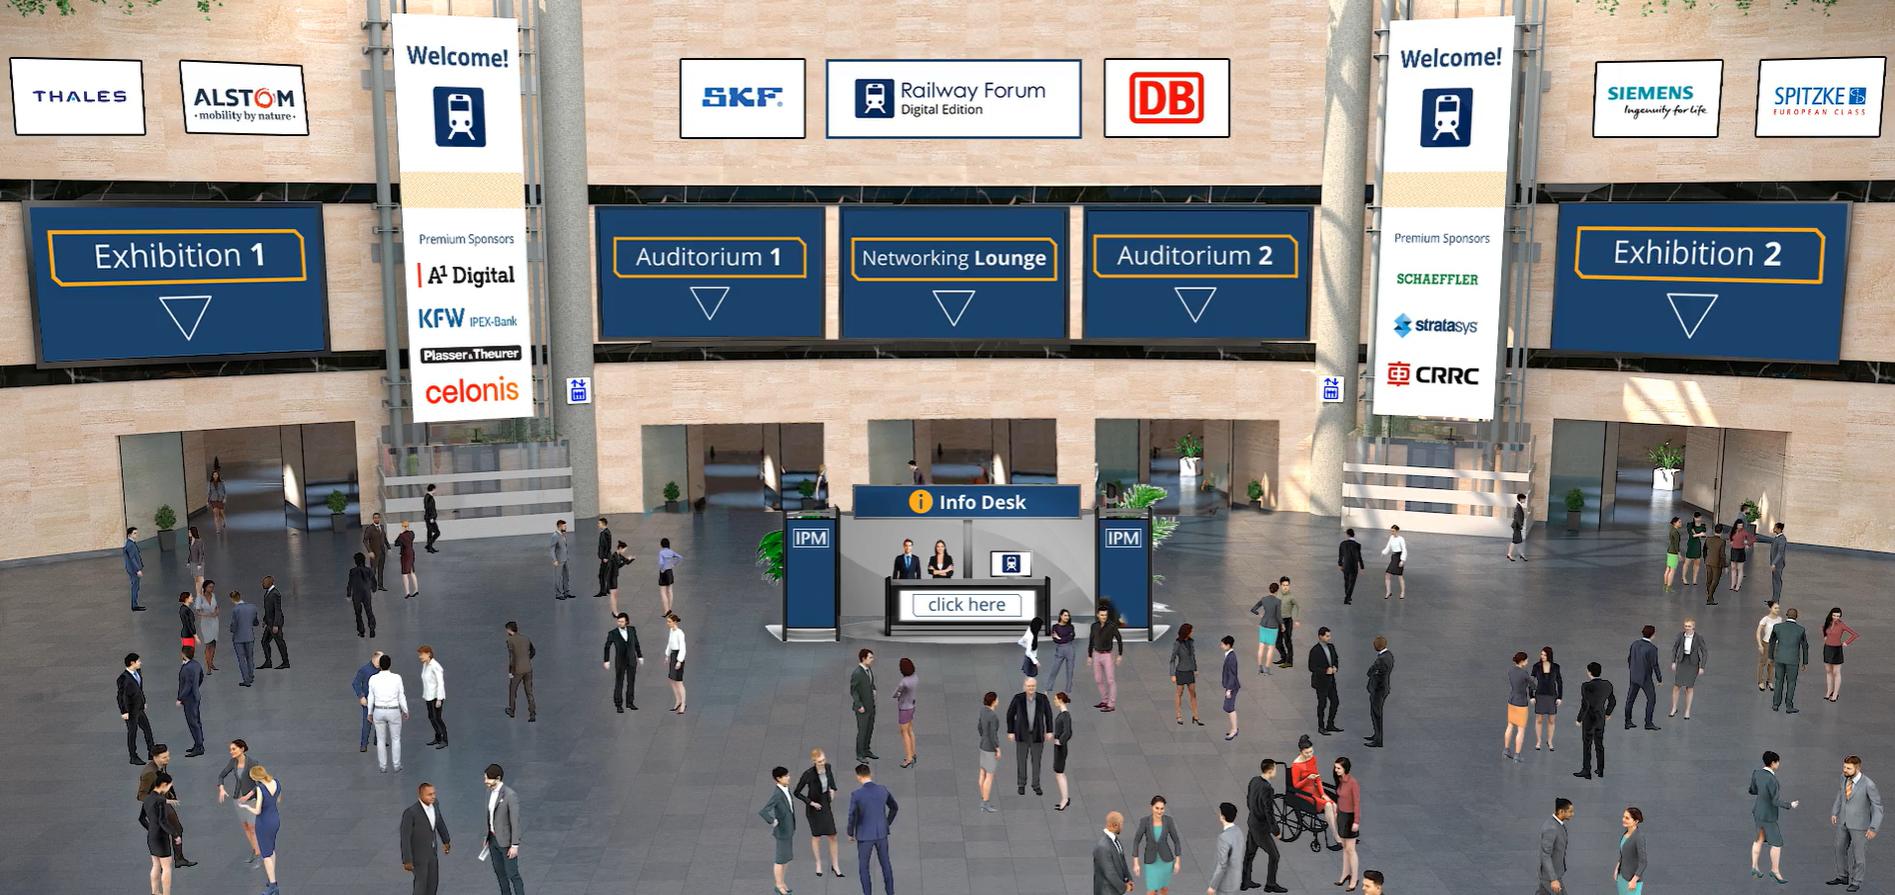 "CRRC ZELC EUROPE participates in the ""Railway Forum Digital Edition 2020"""